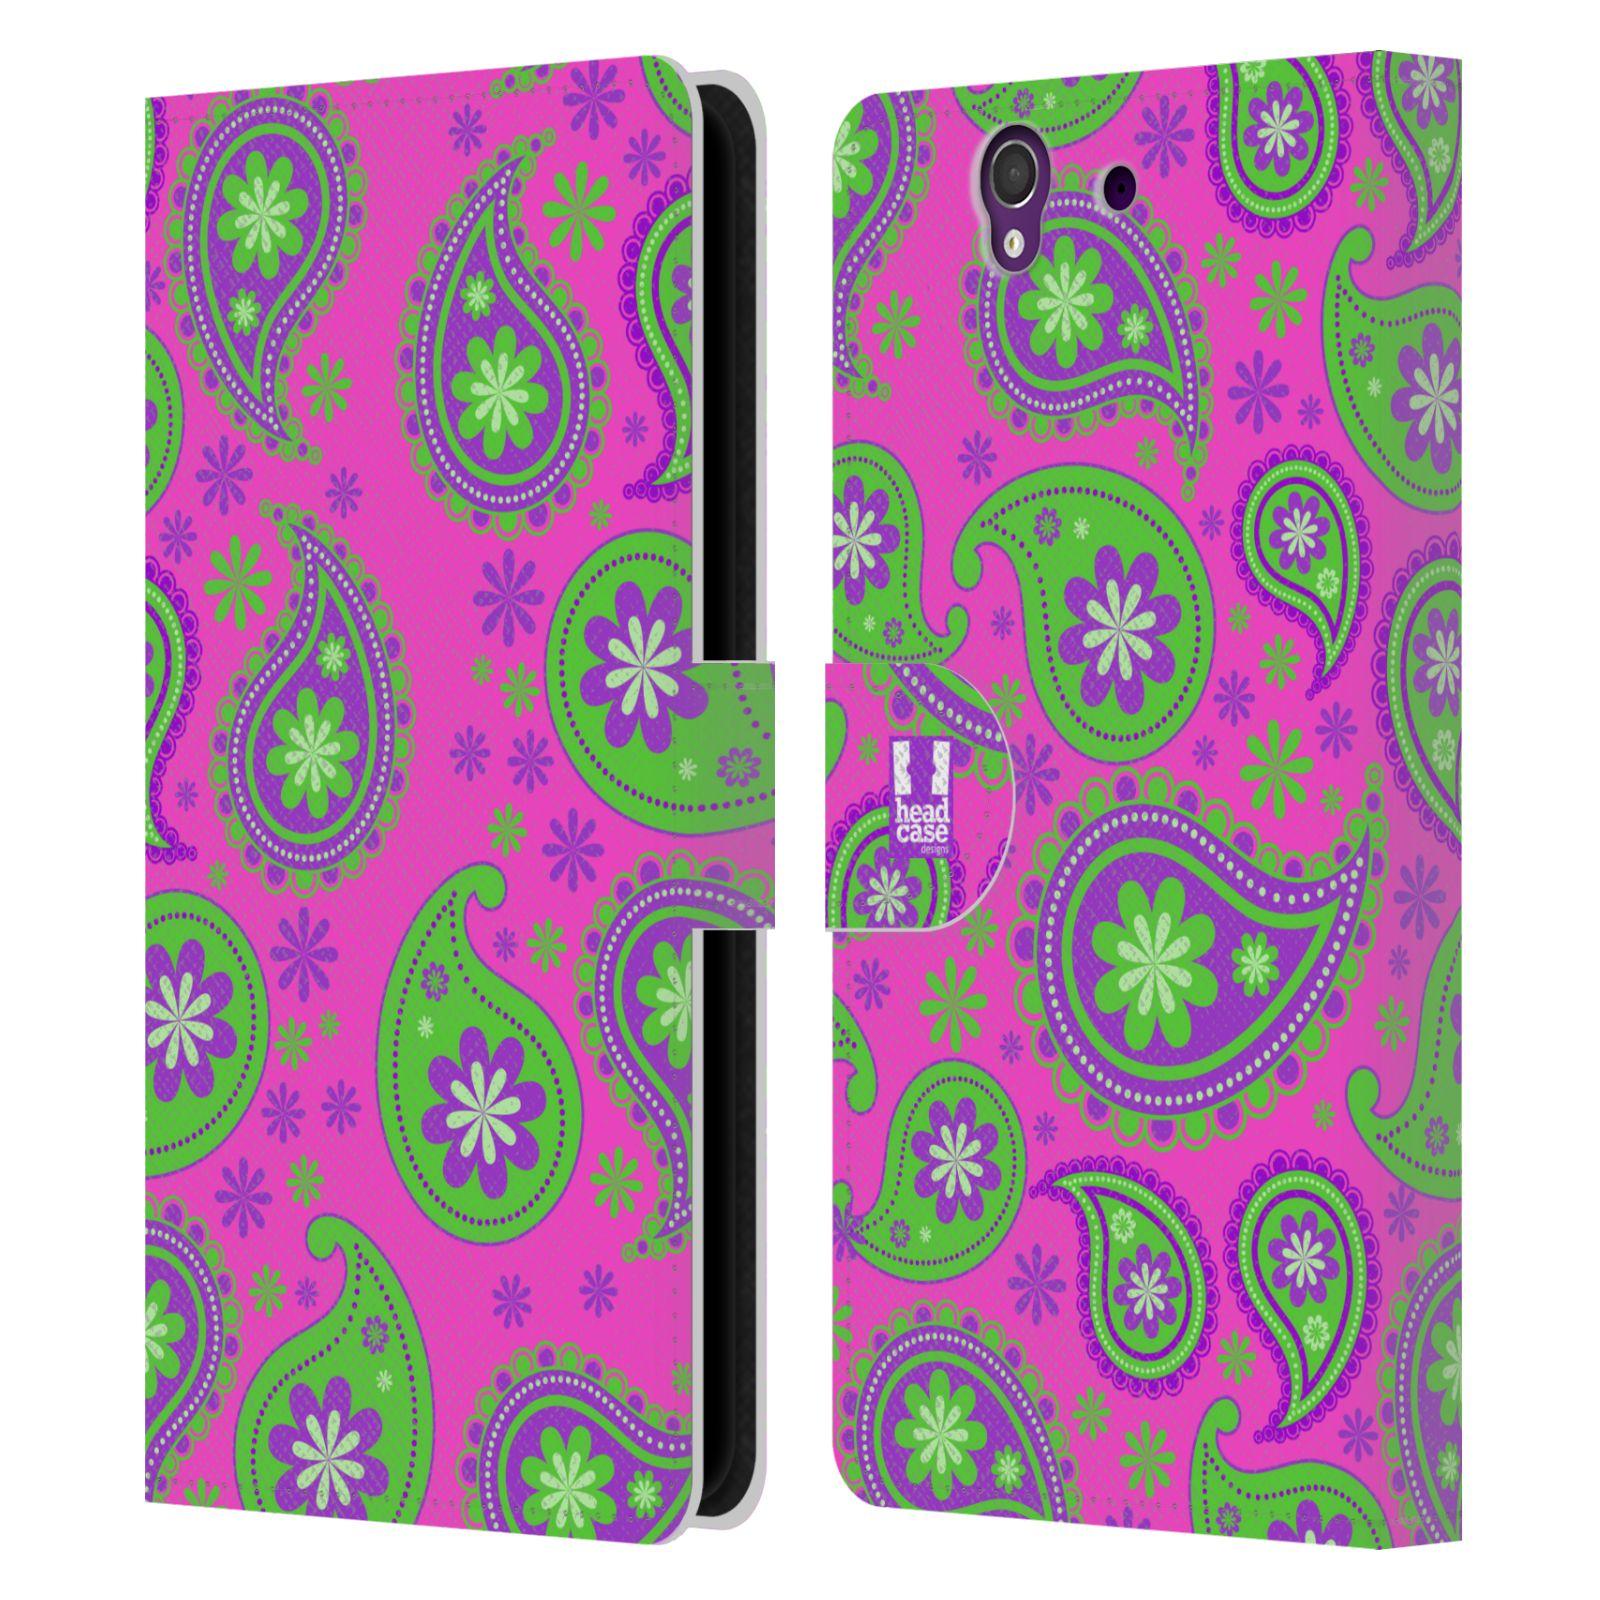 HEAD CASE Flipové pouzdro pro mobil SONY XPERIA Z (C6603) snové slzy fialová